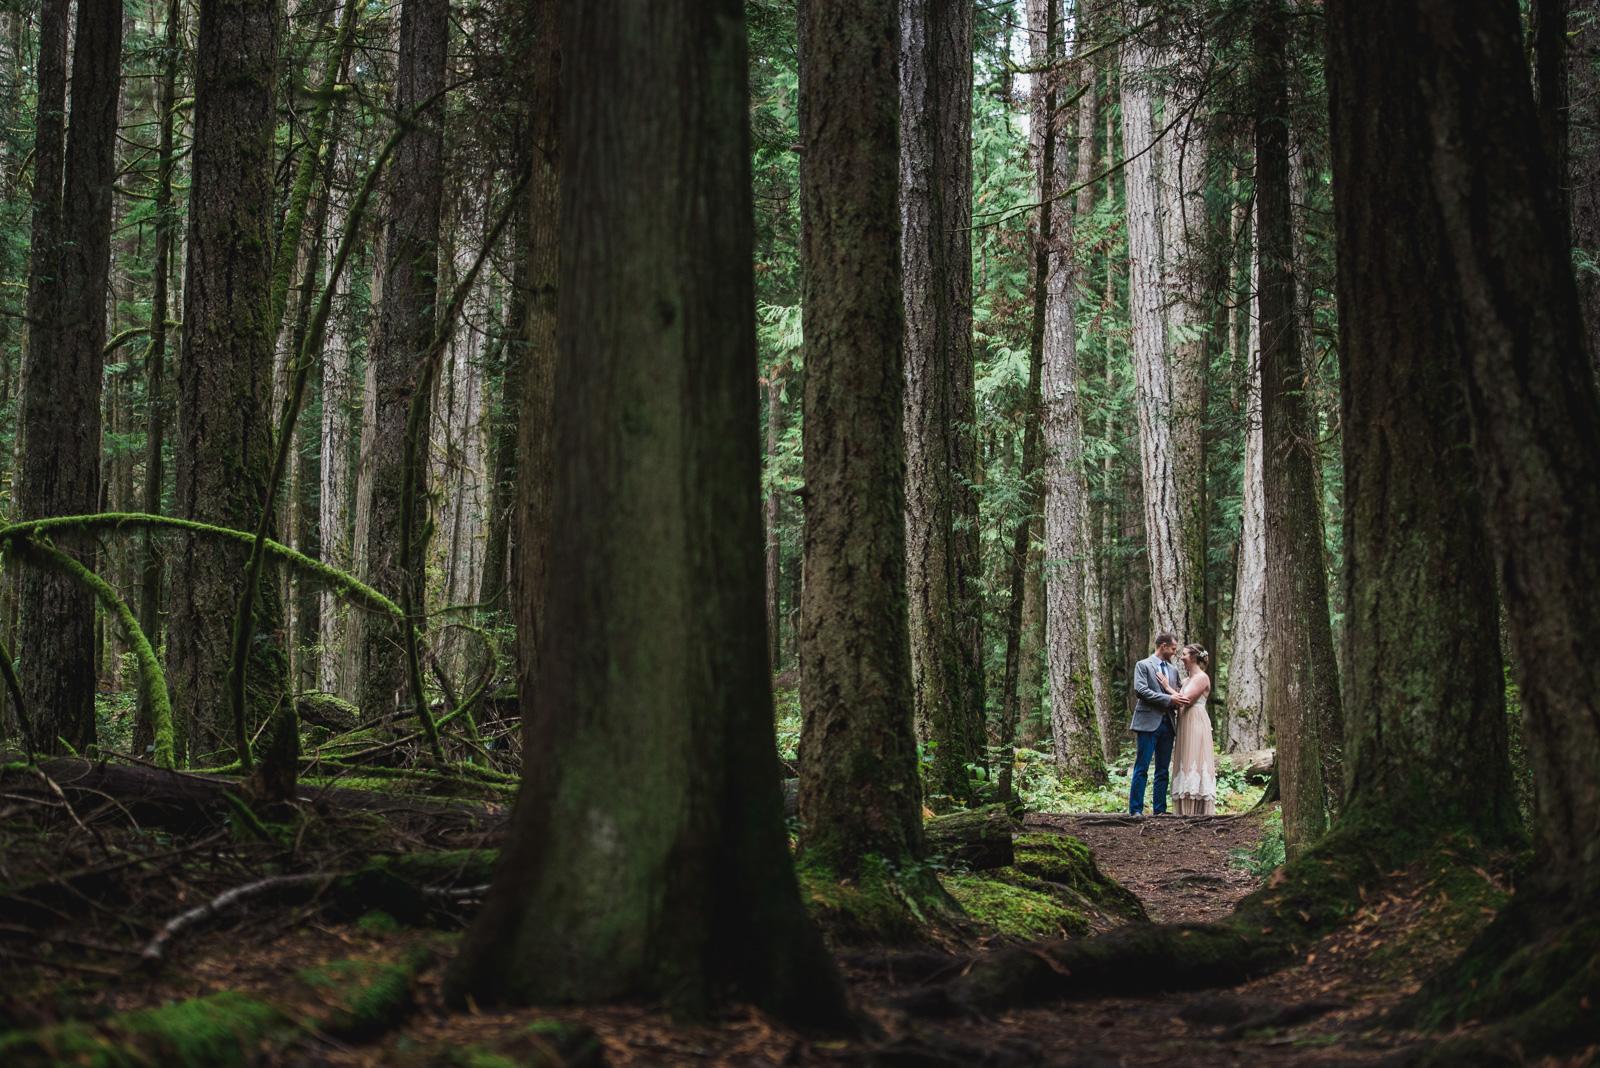 vancouver-island-wedding-photographers-cliff-gilker-park-smugglers-cove-elopement-22.jpg